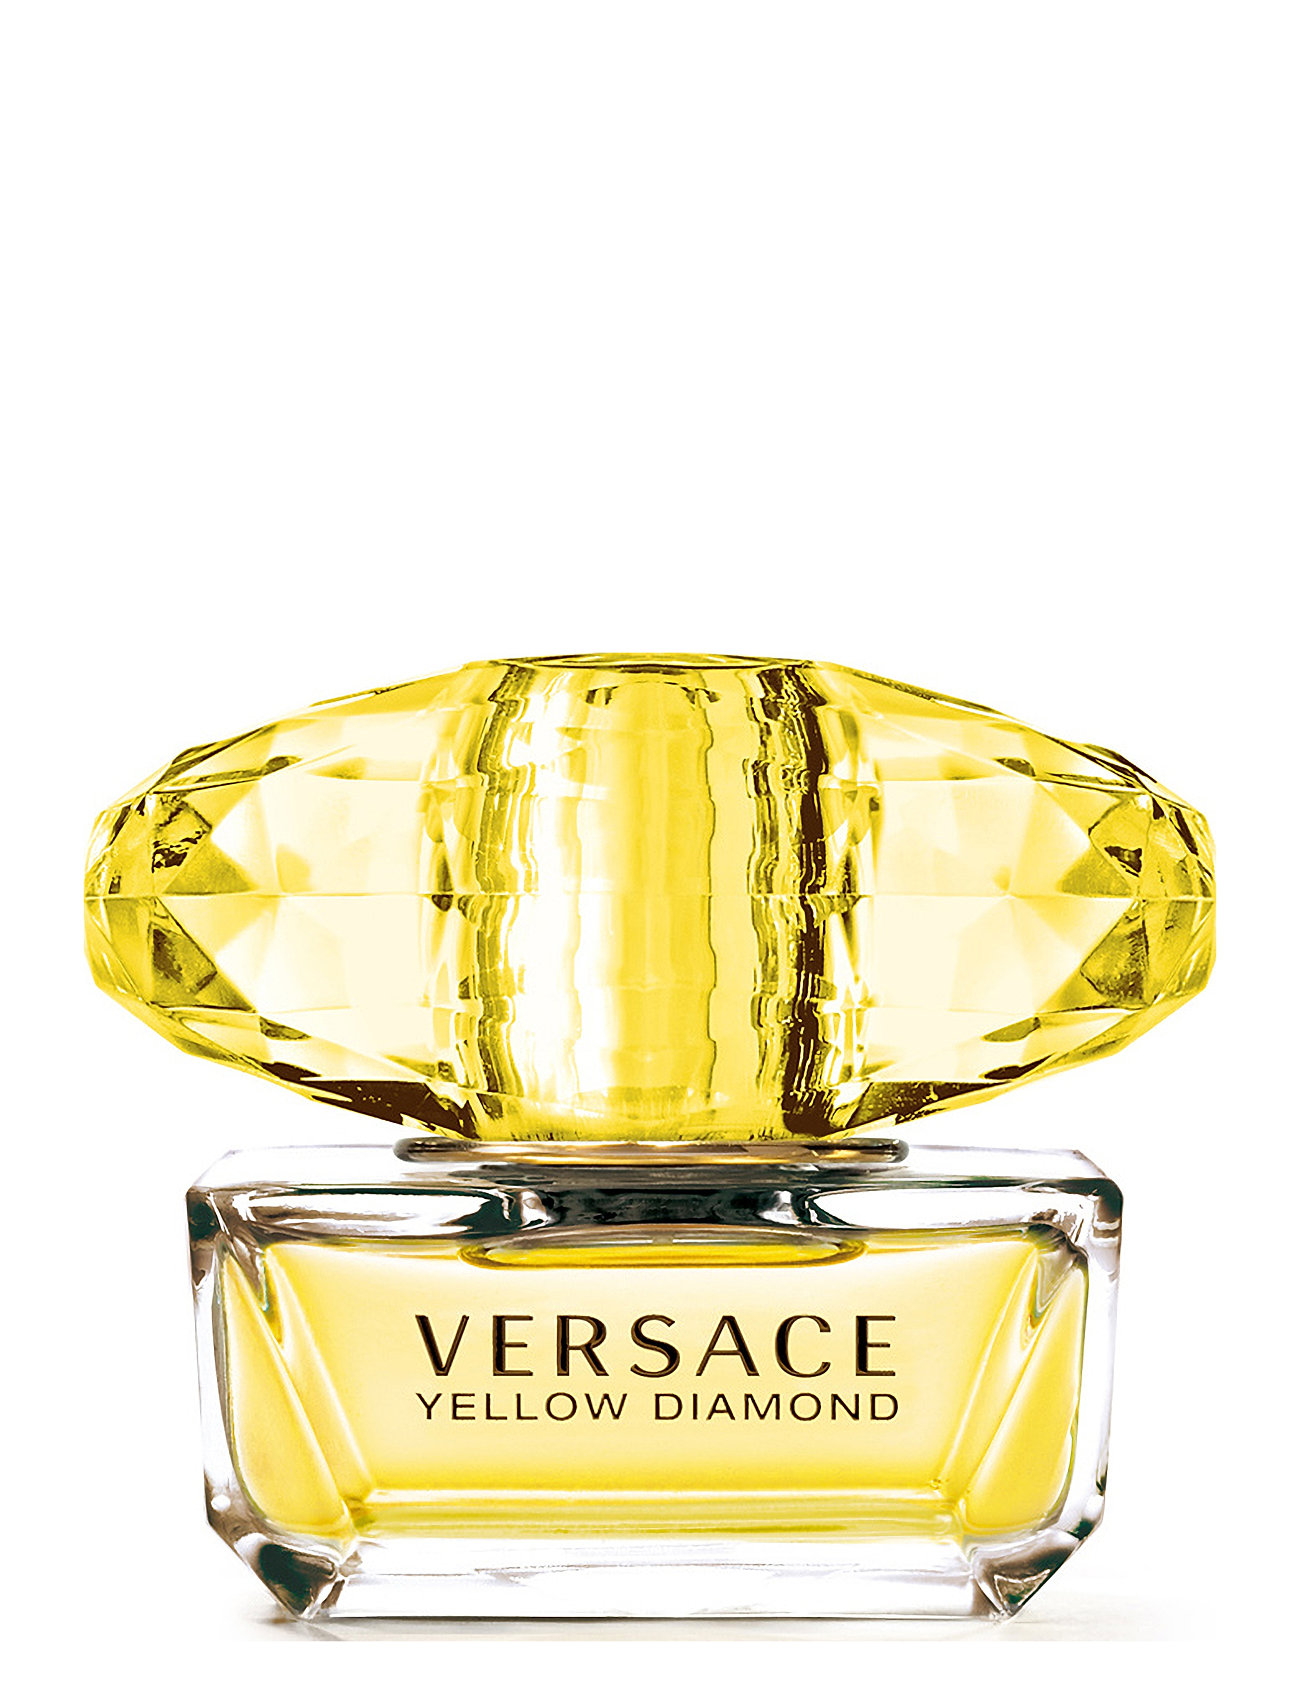 versace fragrance Versace yellow diamond eau de toile fra boozt.com dk